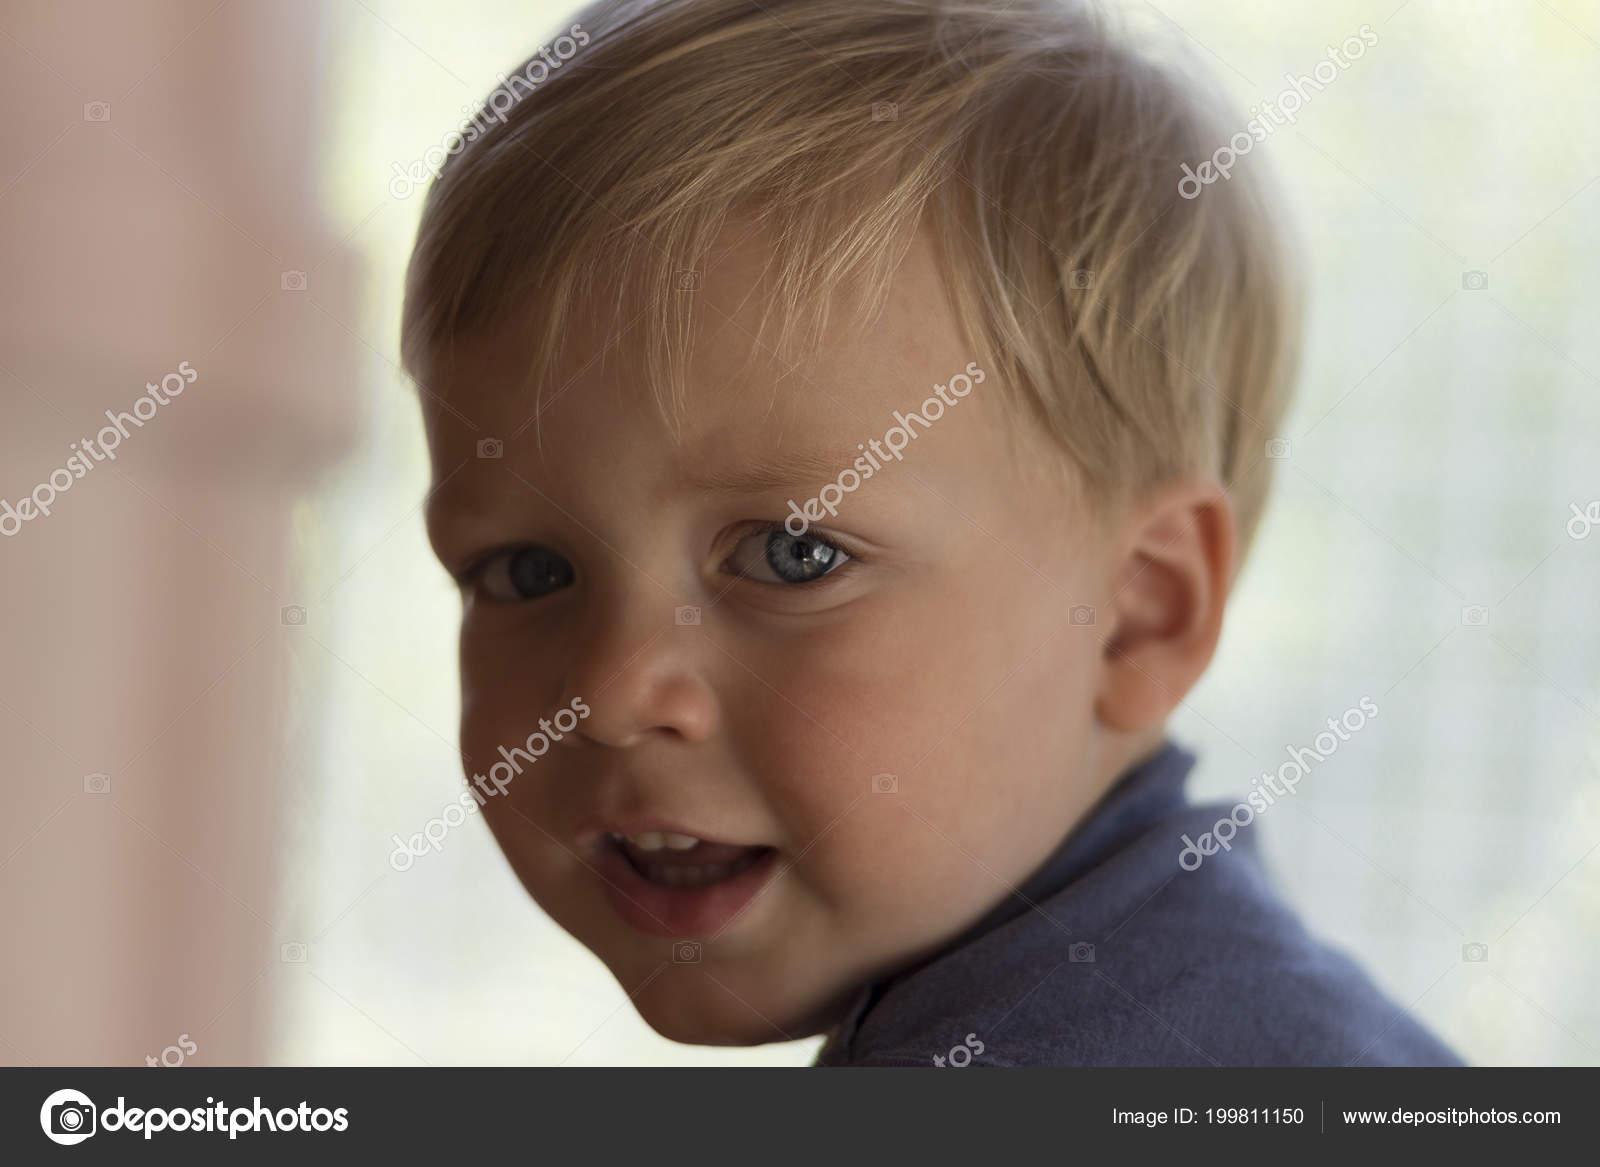 16eeac89c Image of cute baby boy